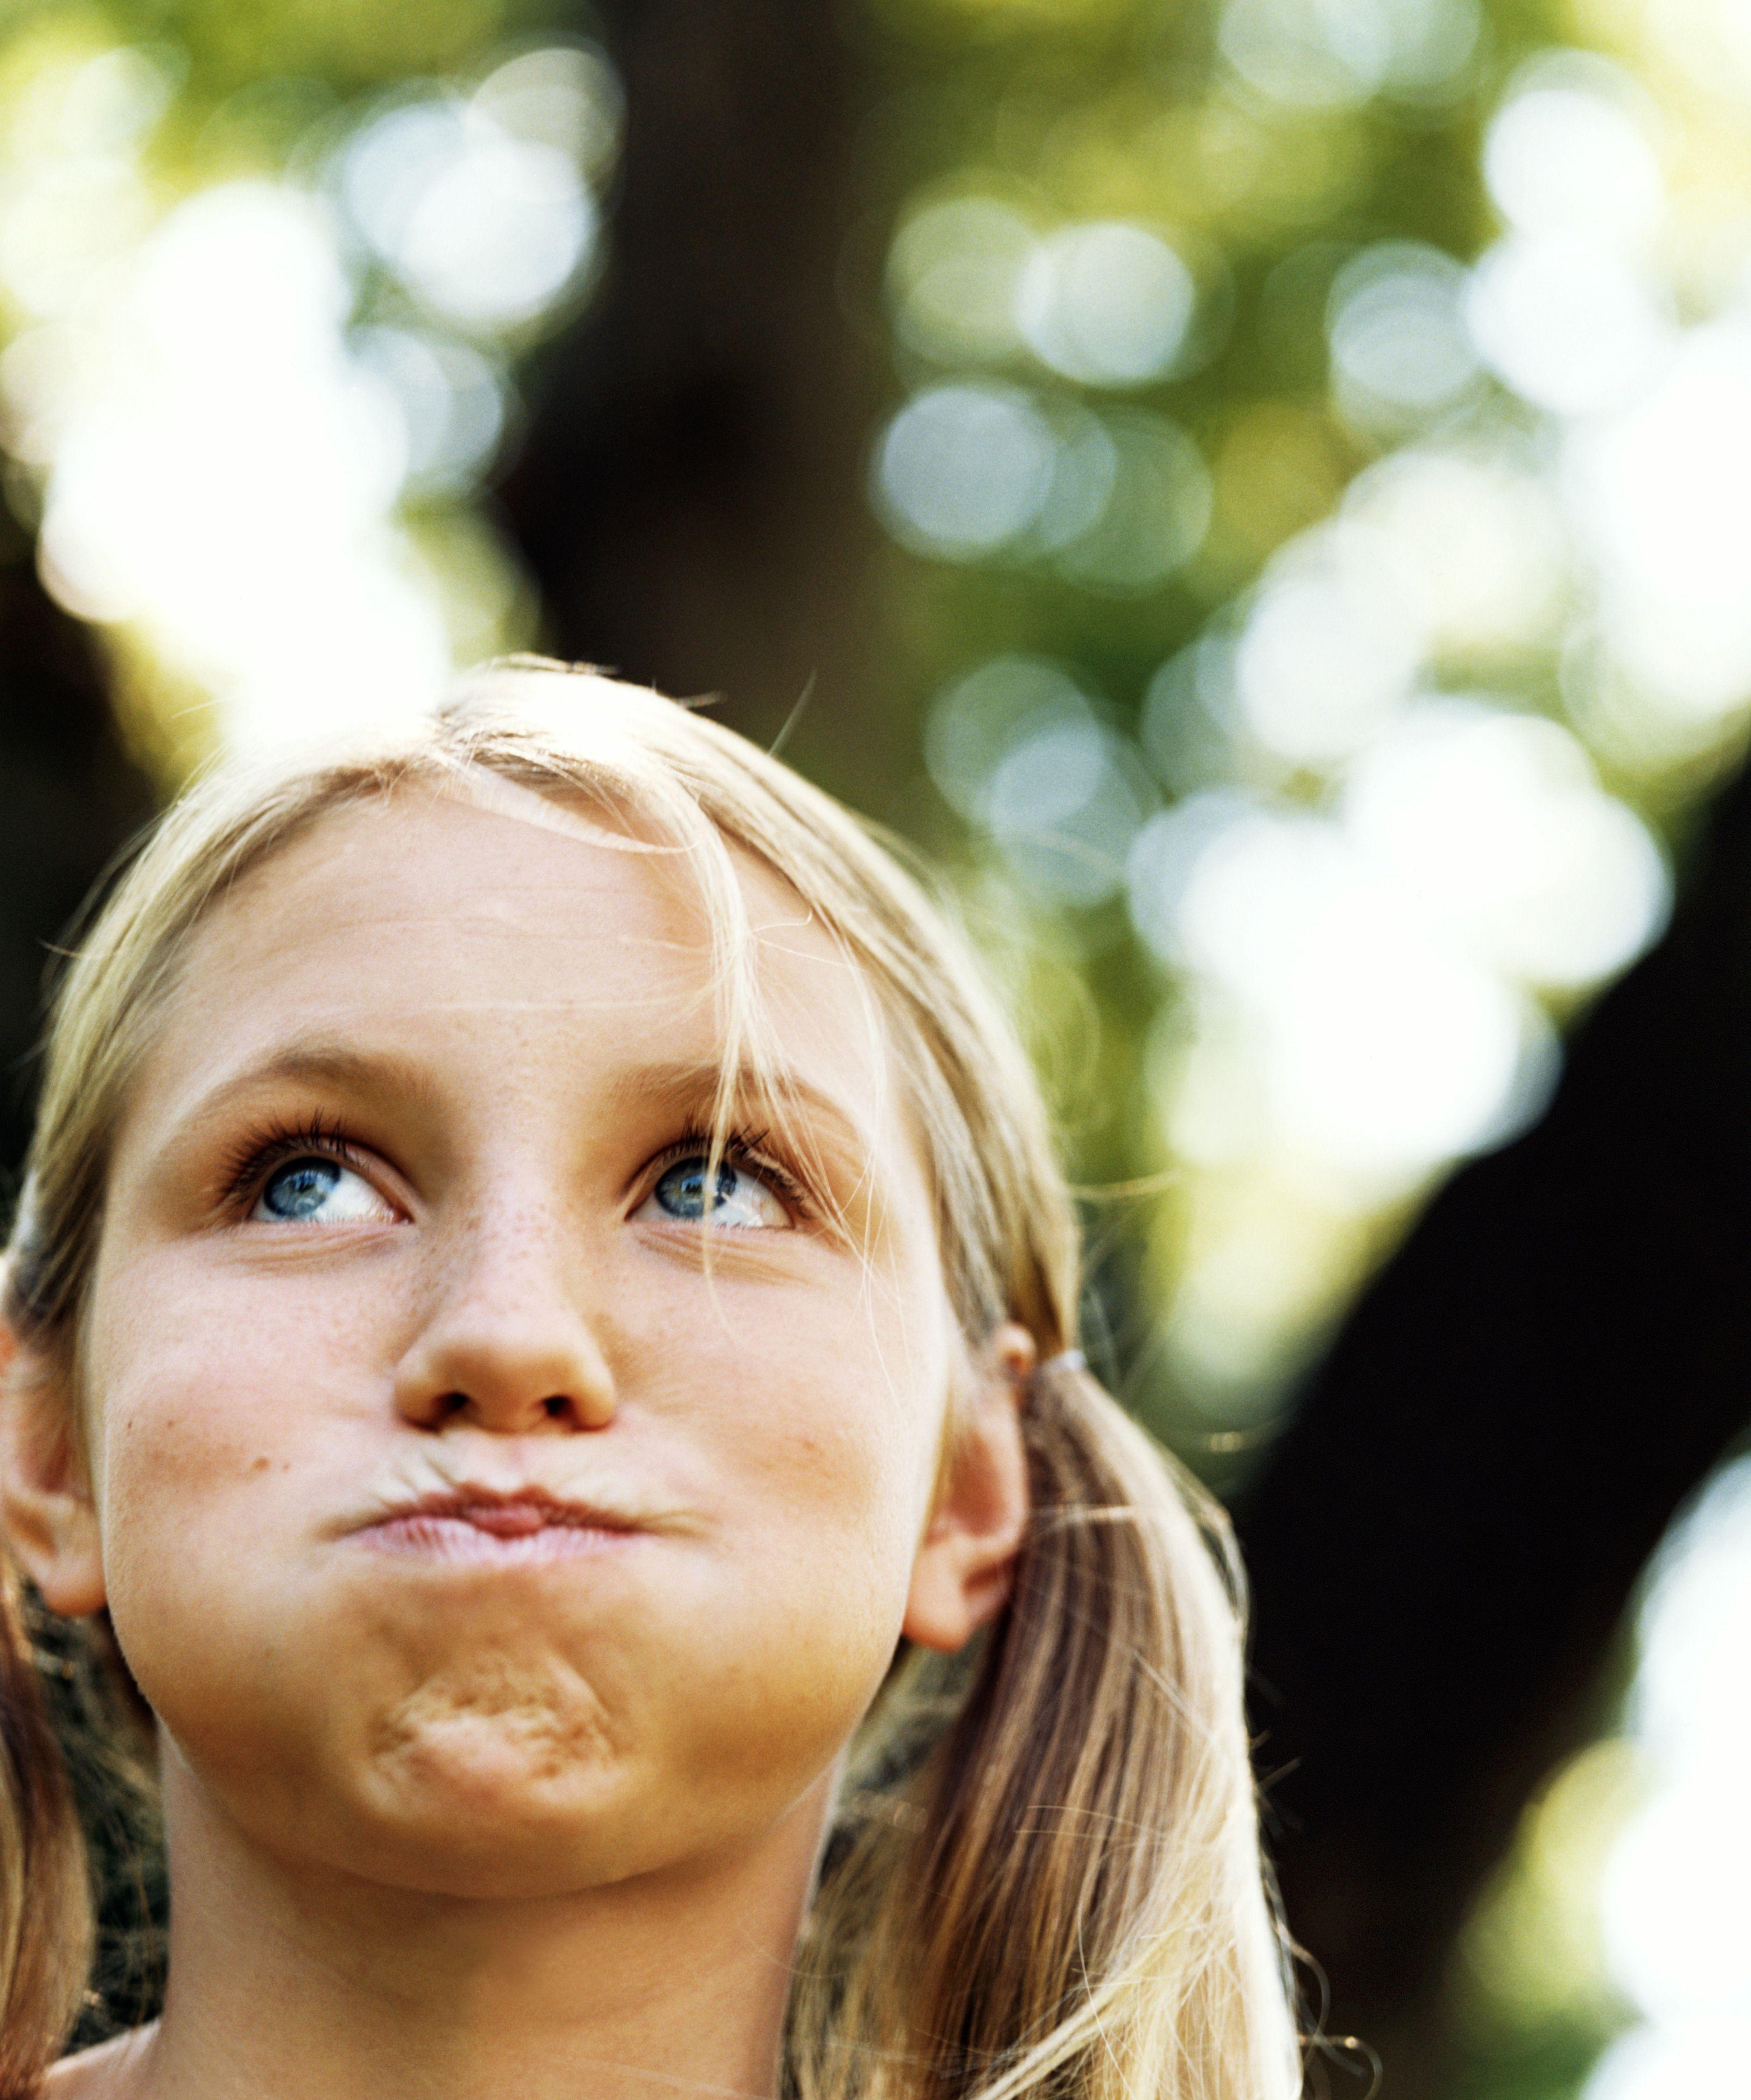 Teenage girl (13-15) holding breath